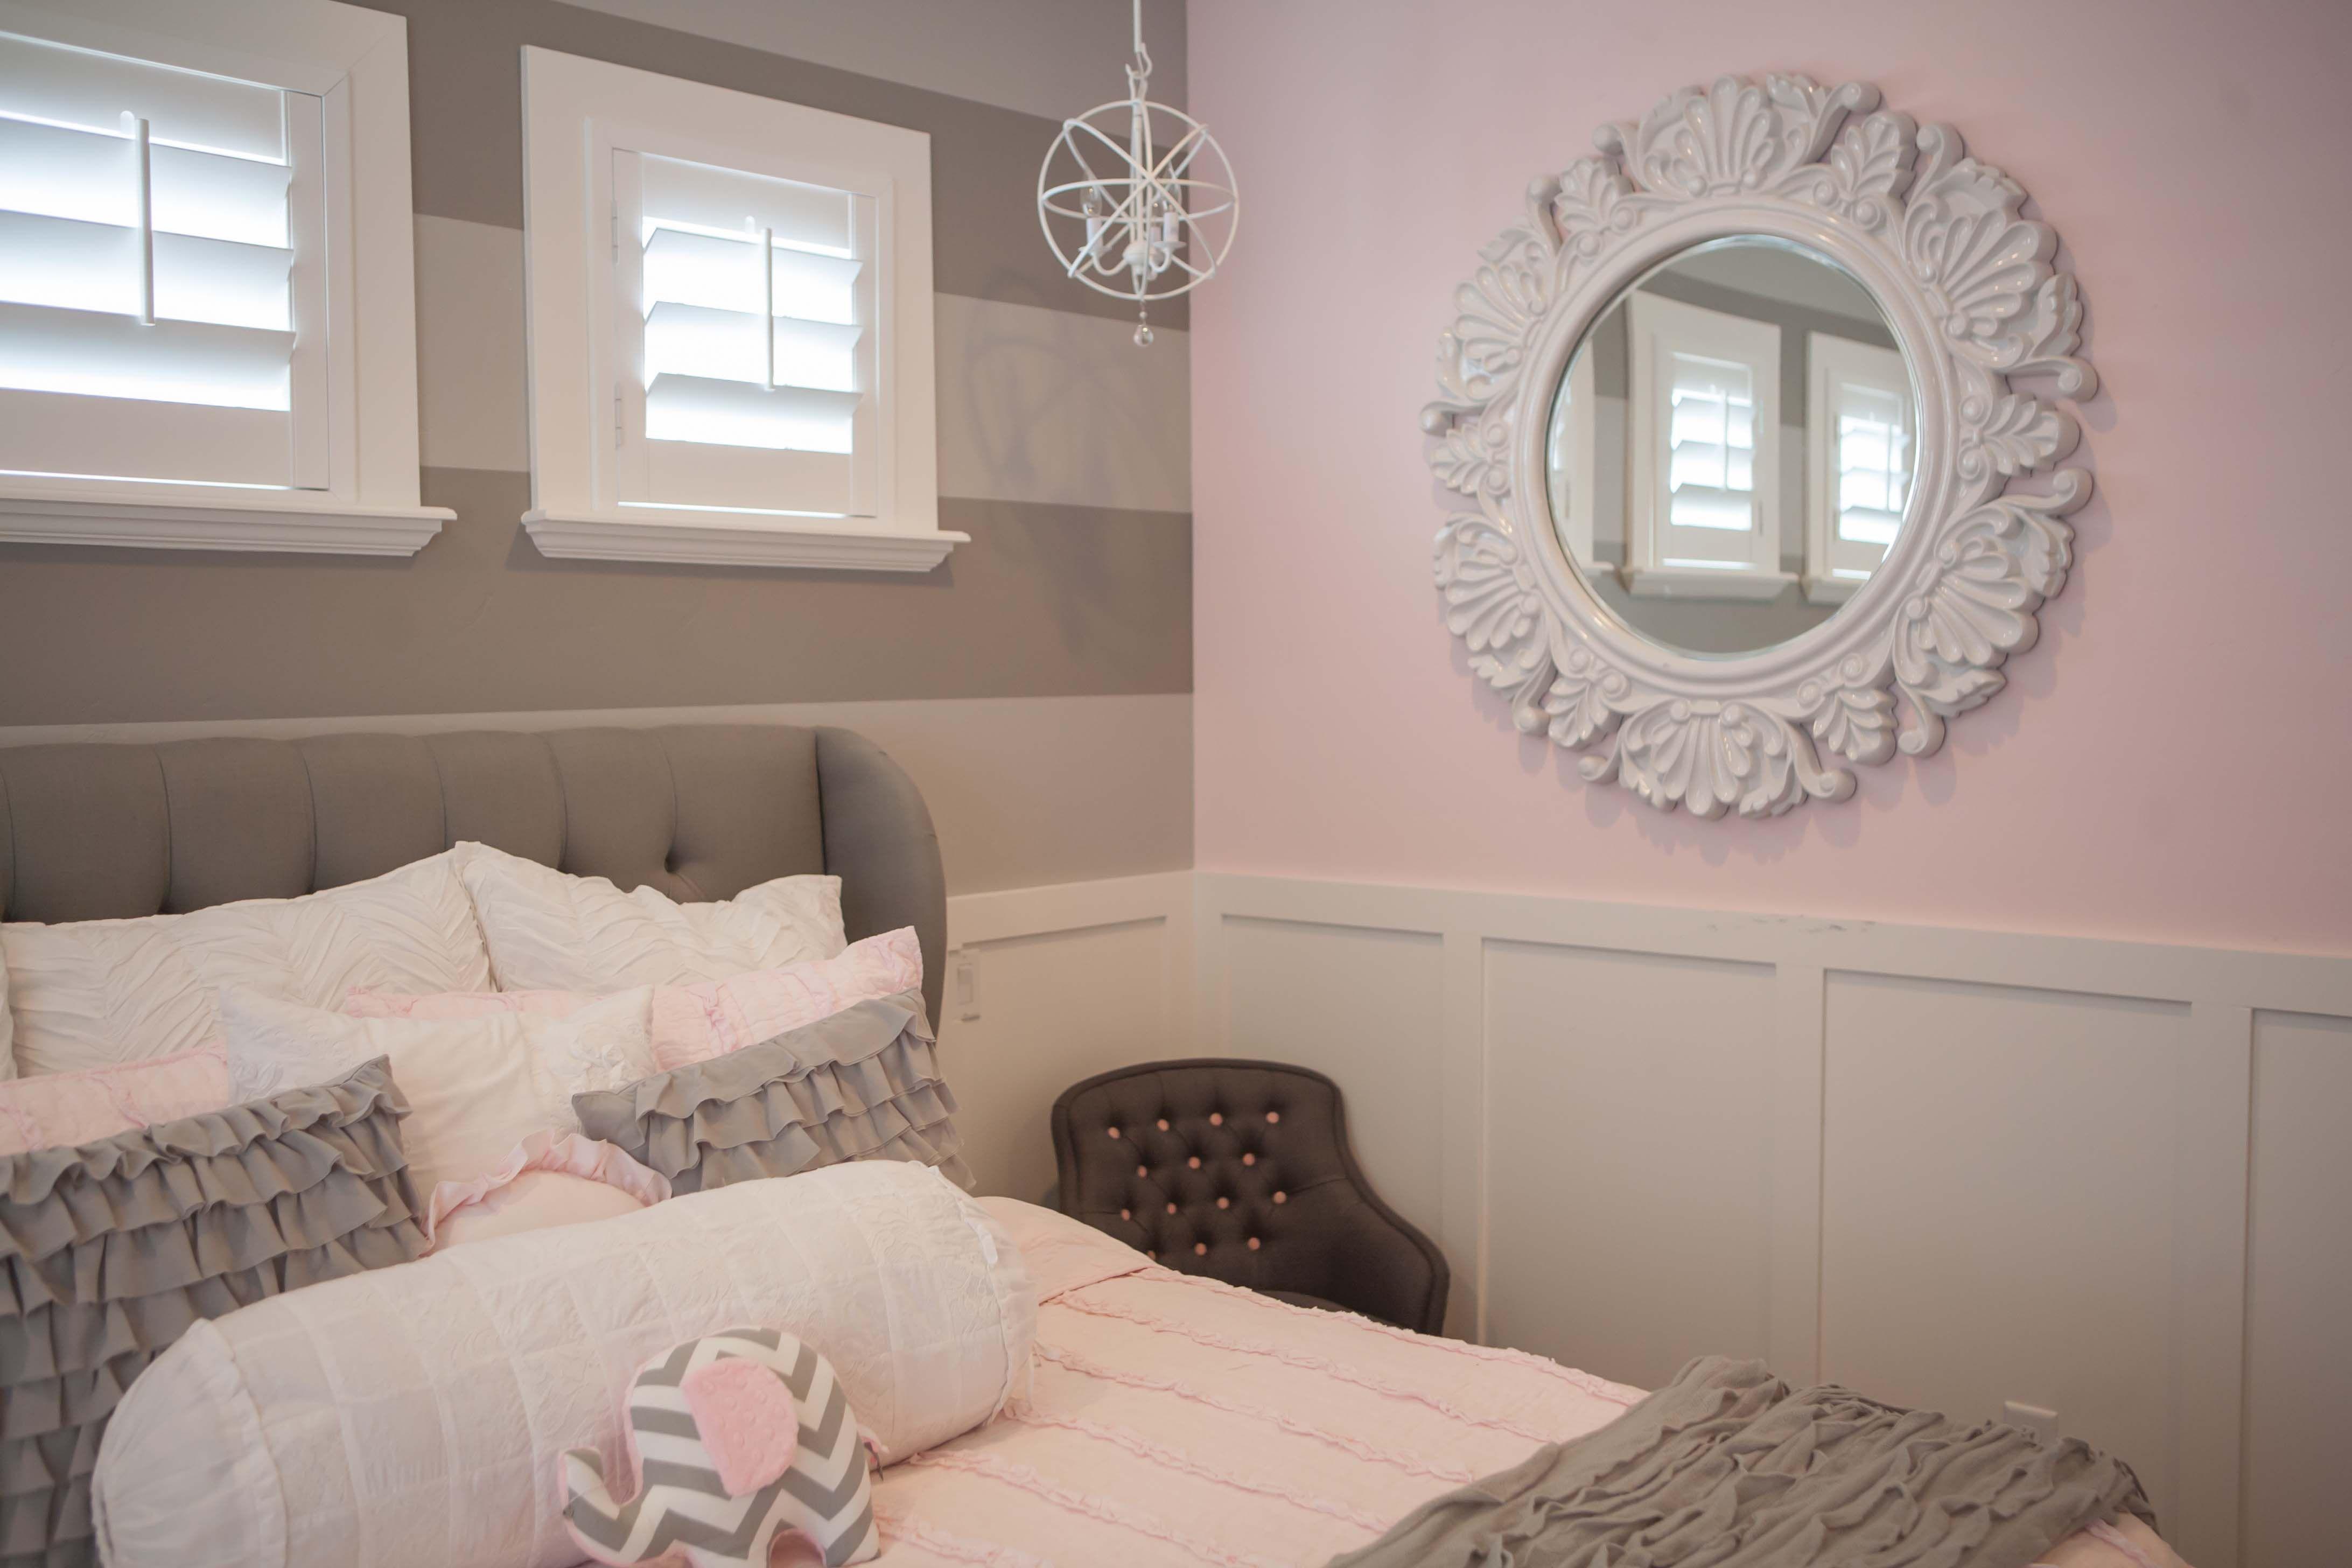 Pink and gray bedroom elliebeandesign lunaus room